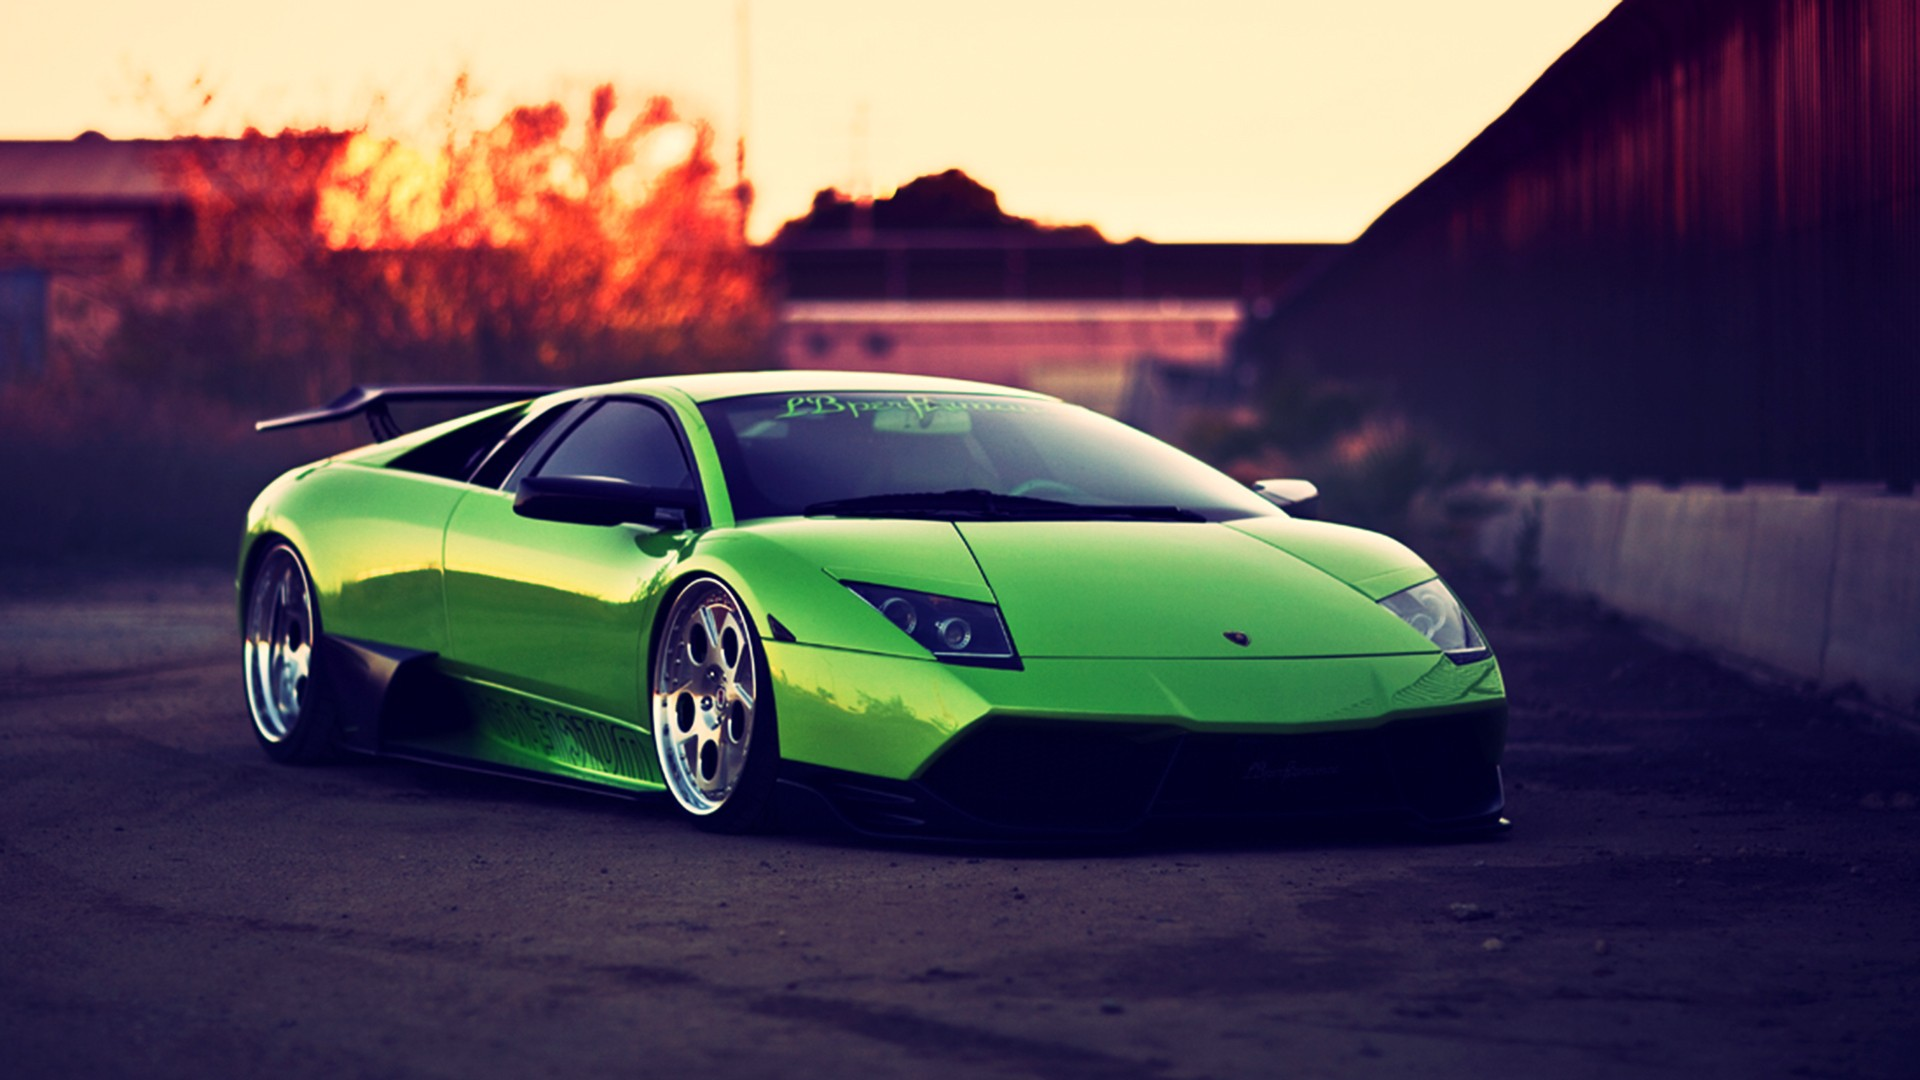 Wallpapers Green And Lamborghini On Pinterest: Green And Black Lamborghini Wallpaper 4 Free Hd Wallpaper